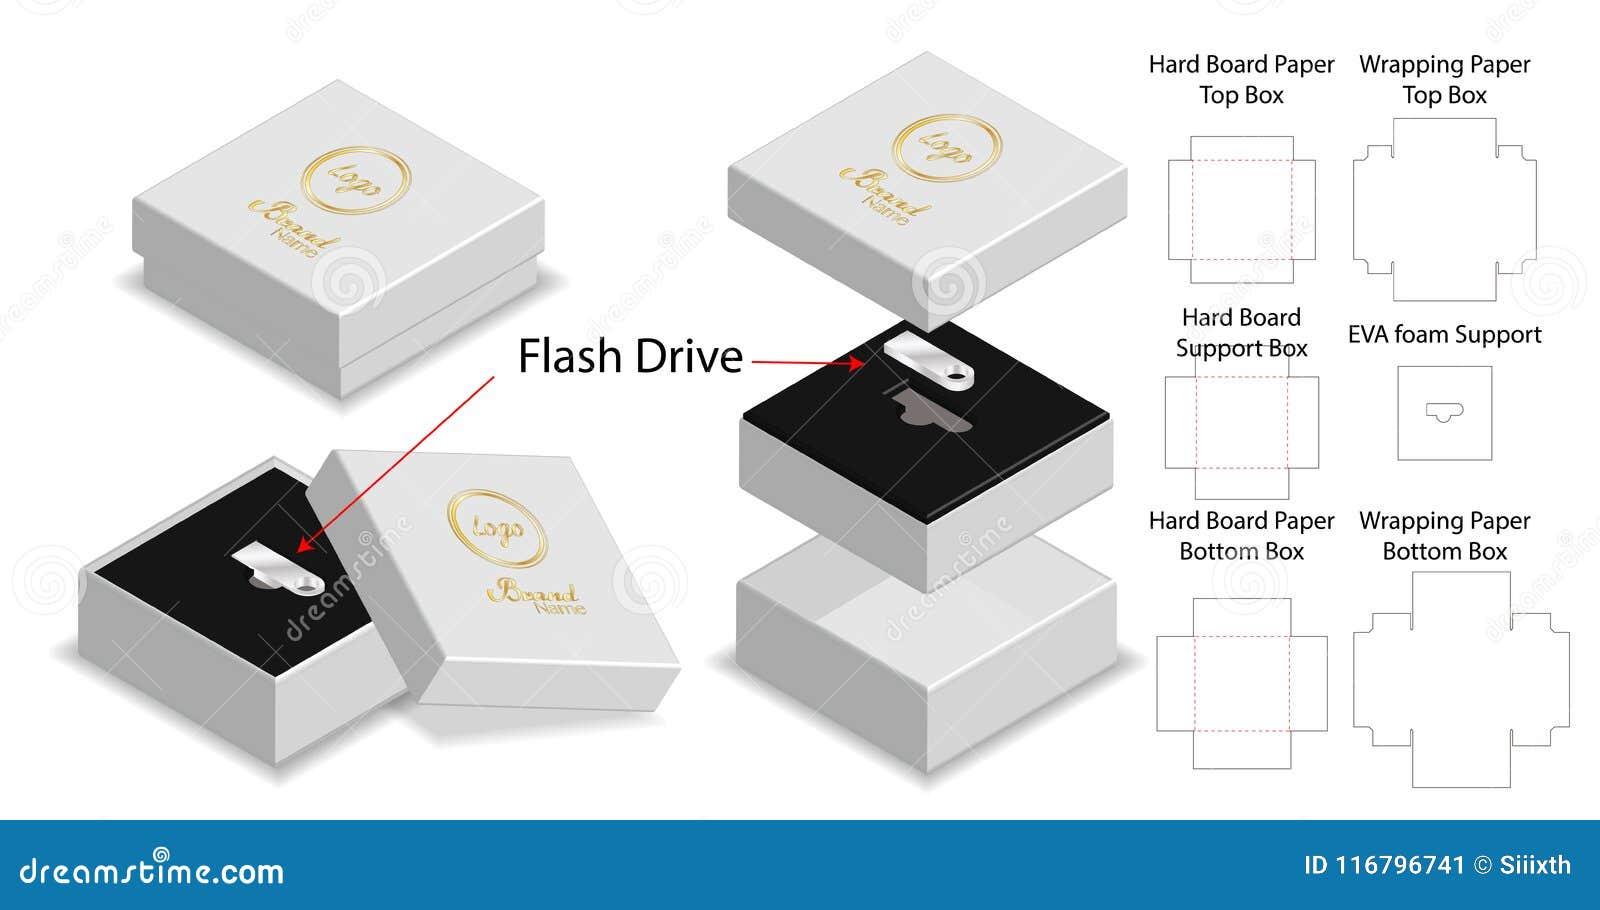 Rigid Box For Flash Drive Packaging Die-cut Mockup Stock